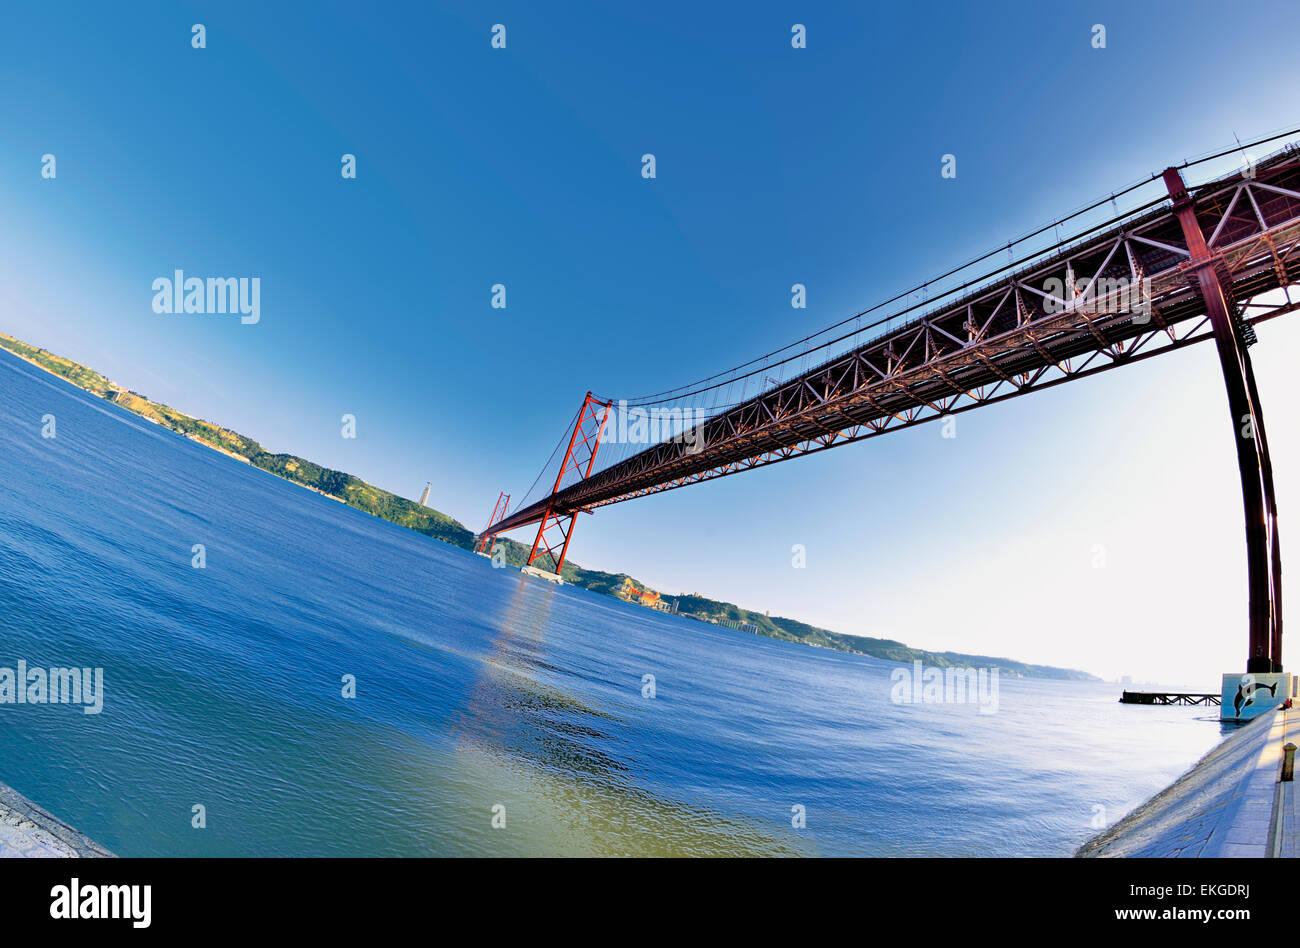 Portugal, Lisbon: Different perspective of the bridge Ponte 25 de Abril Stock Photo